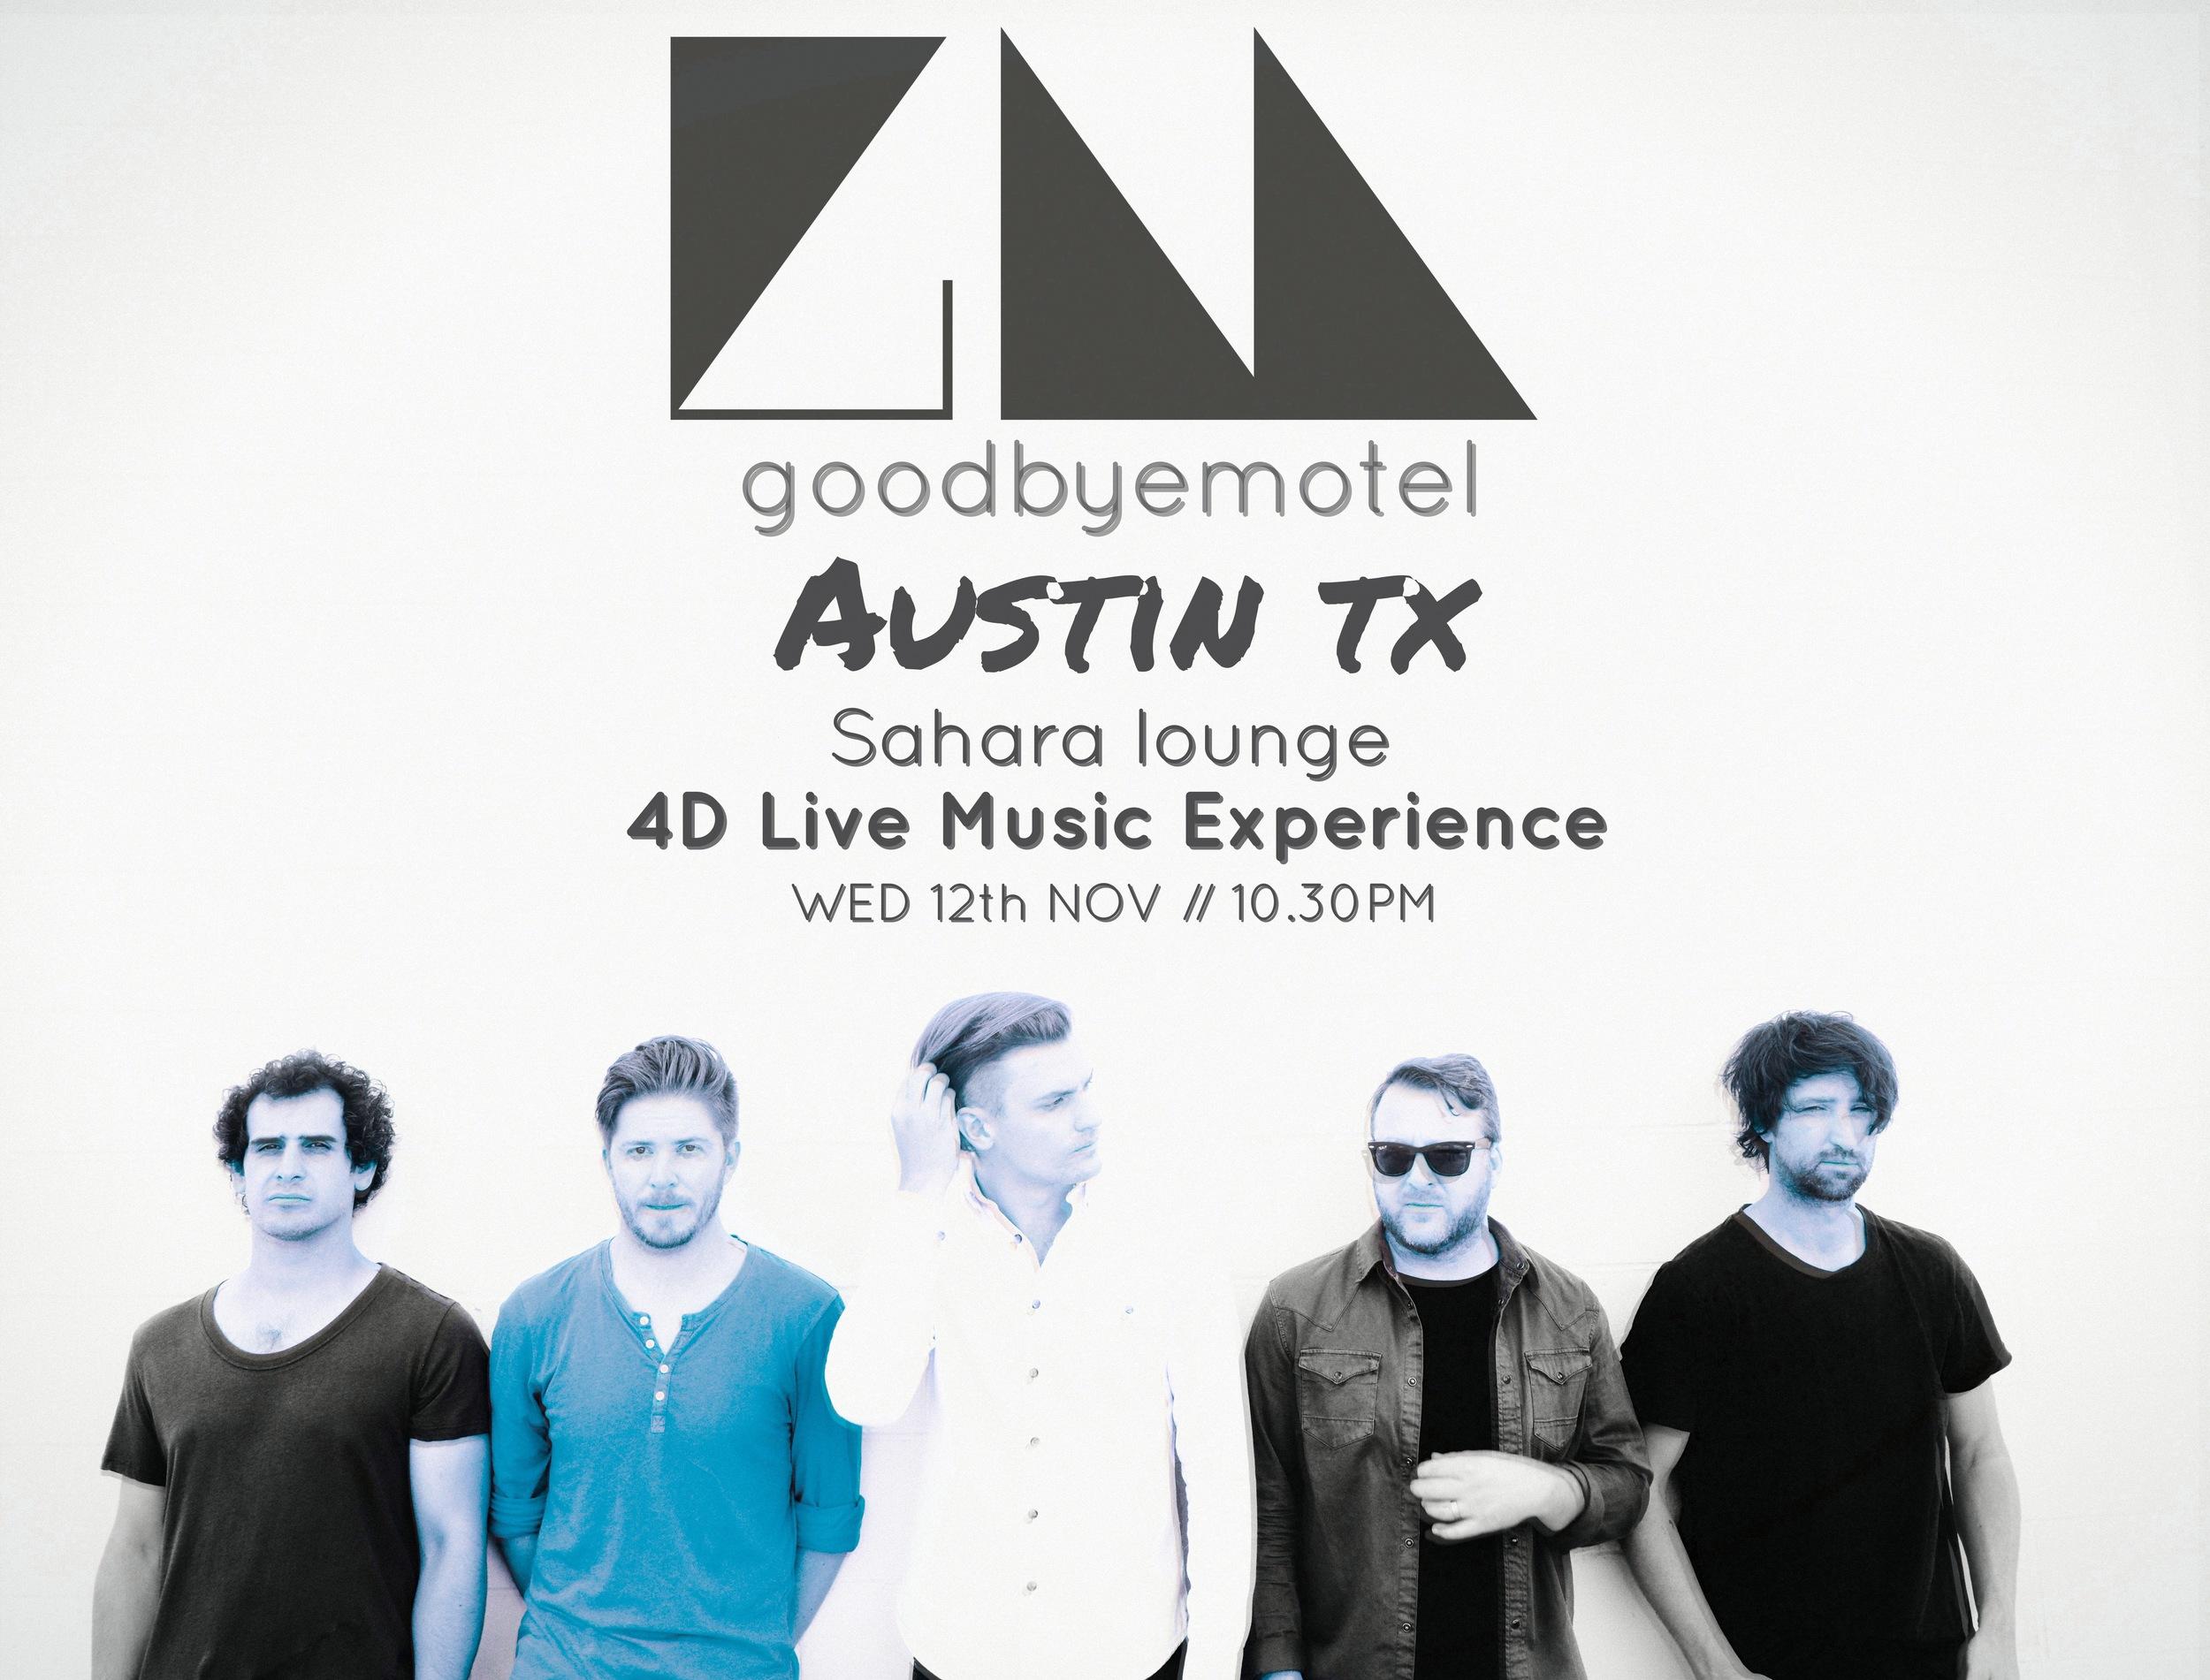 goodbyemotel-austin-texas-12th-nov-2014-sahara-lounge-4d-live-music-experience